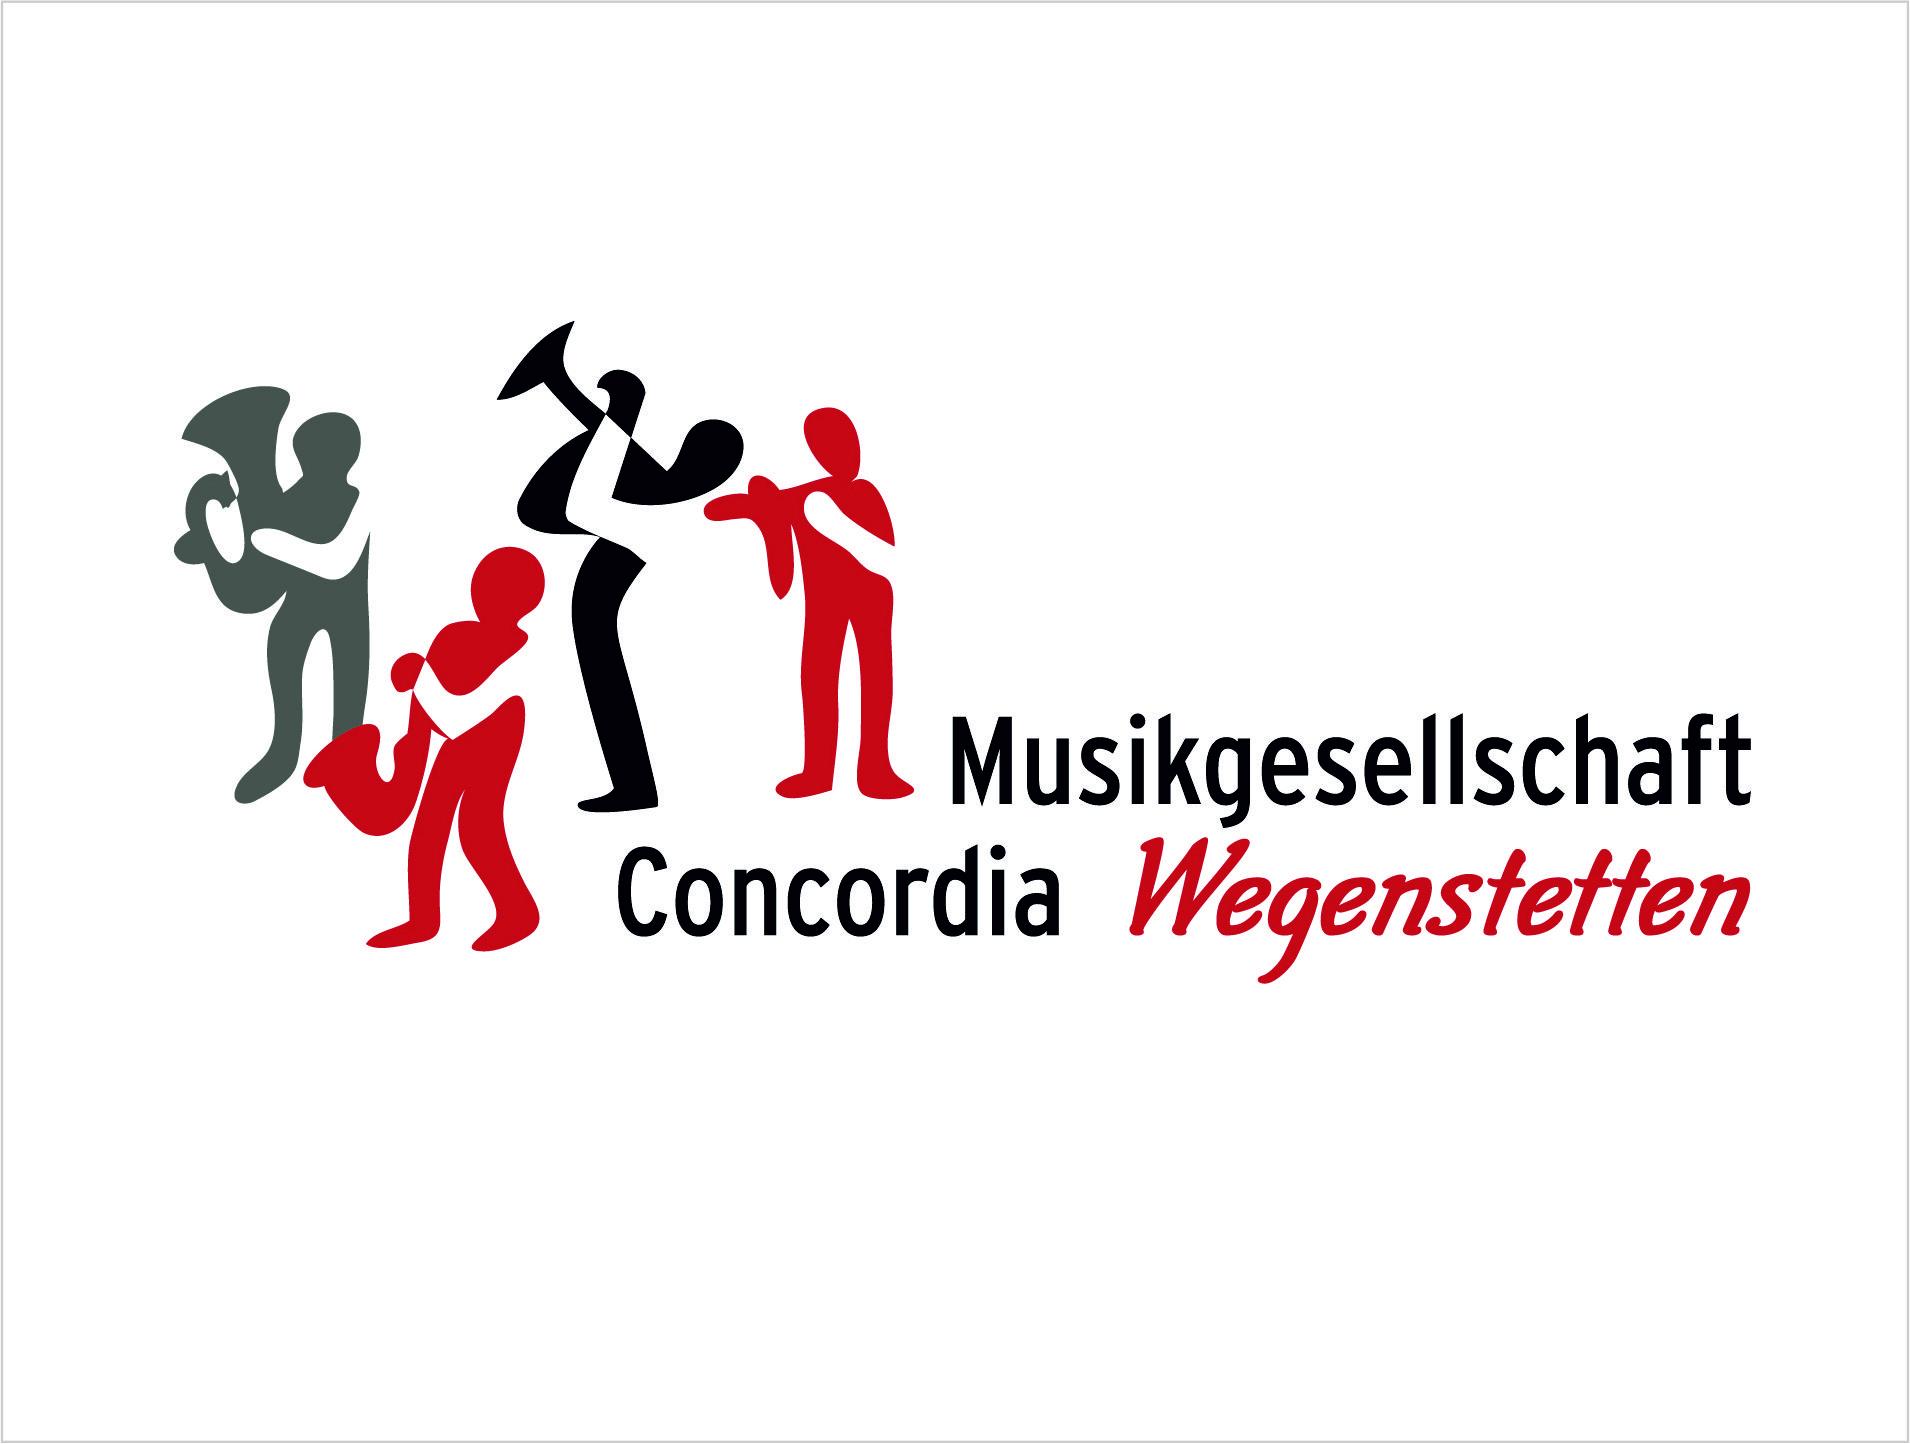 Musikgesellschaft Concordia Wegenstetten